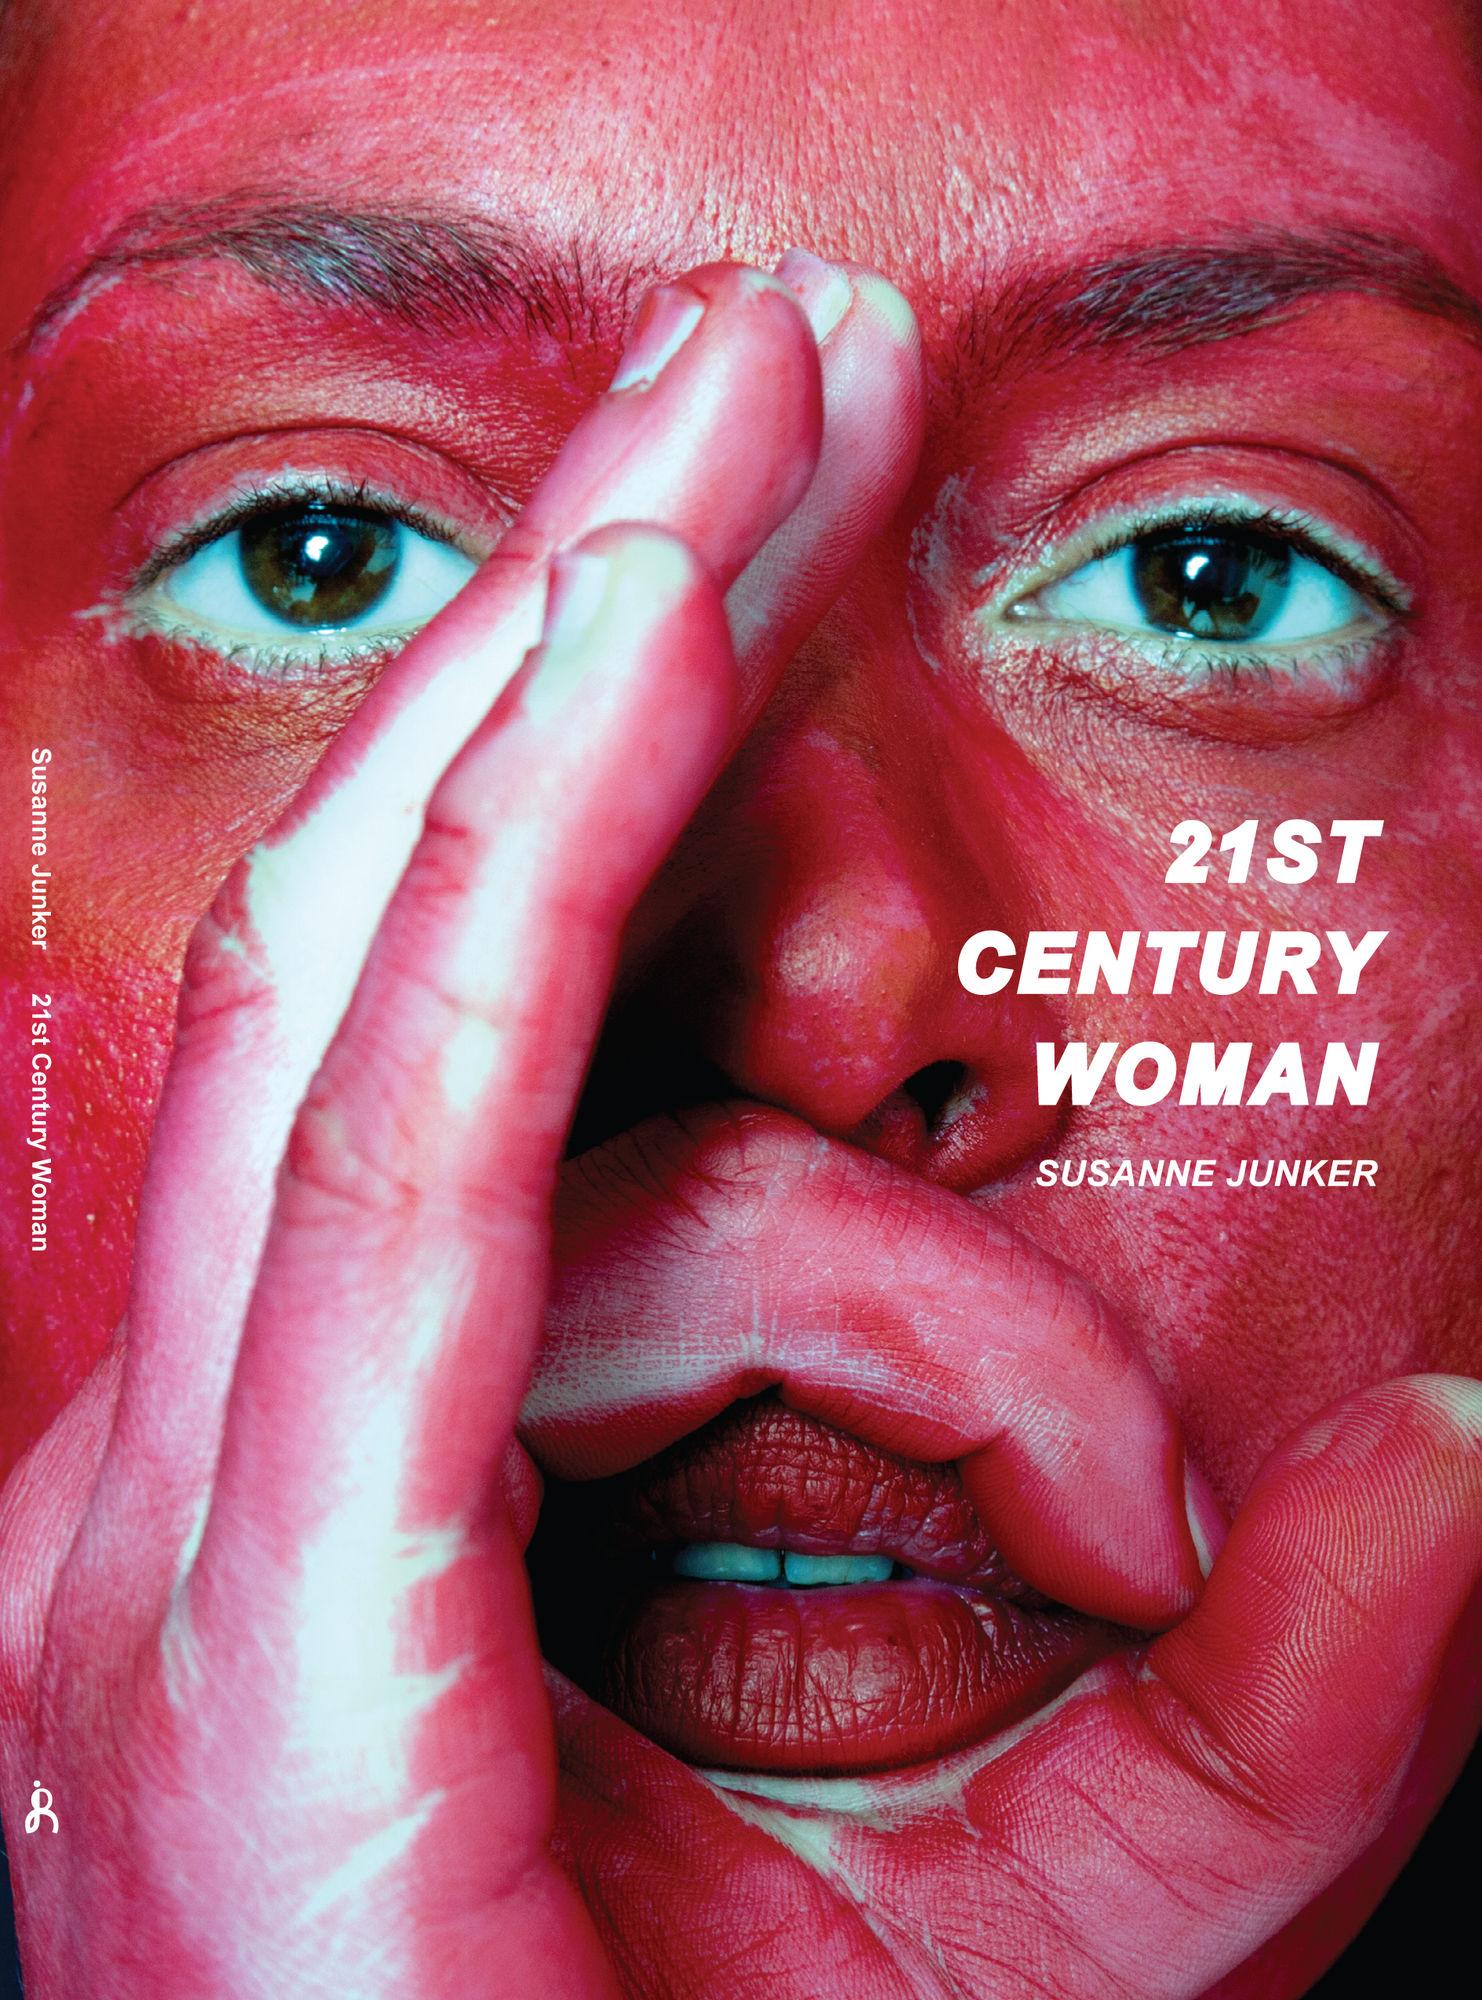 Susanne Junker new book, 21st CENTURY WOMAN -- CHRISTMAS PROMOTION!!